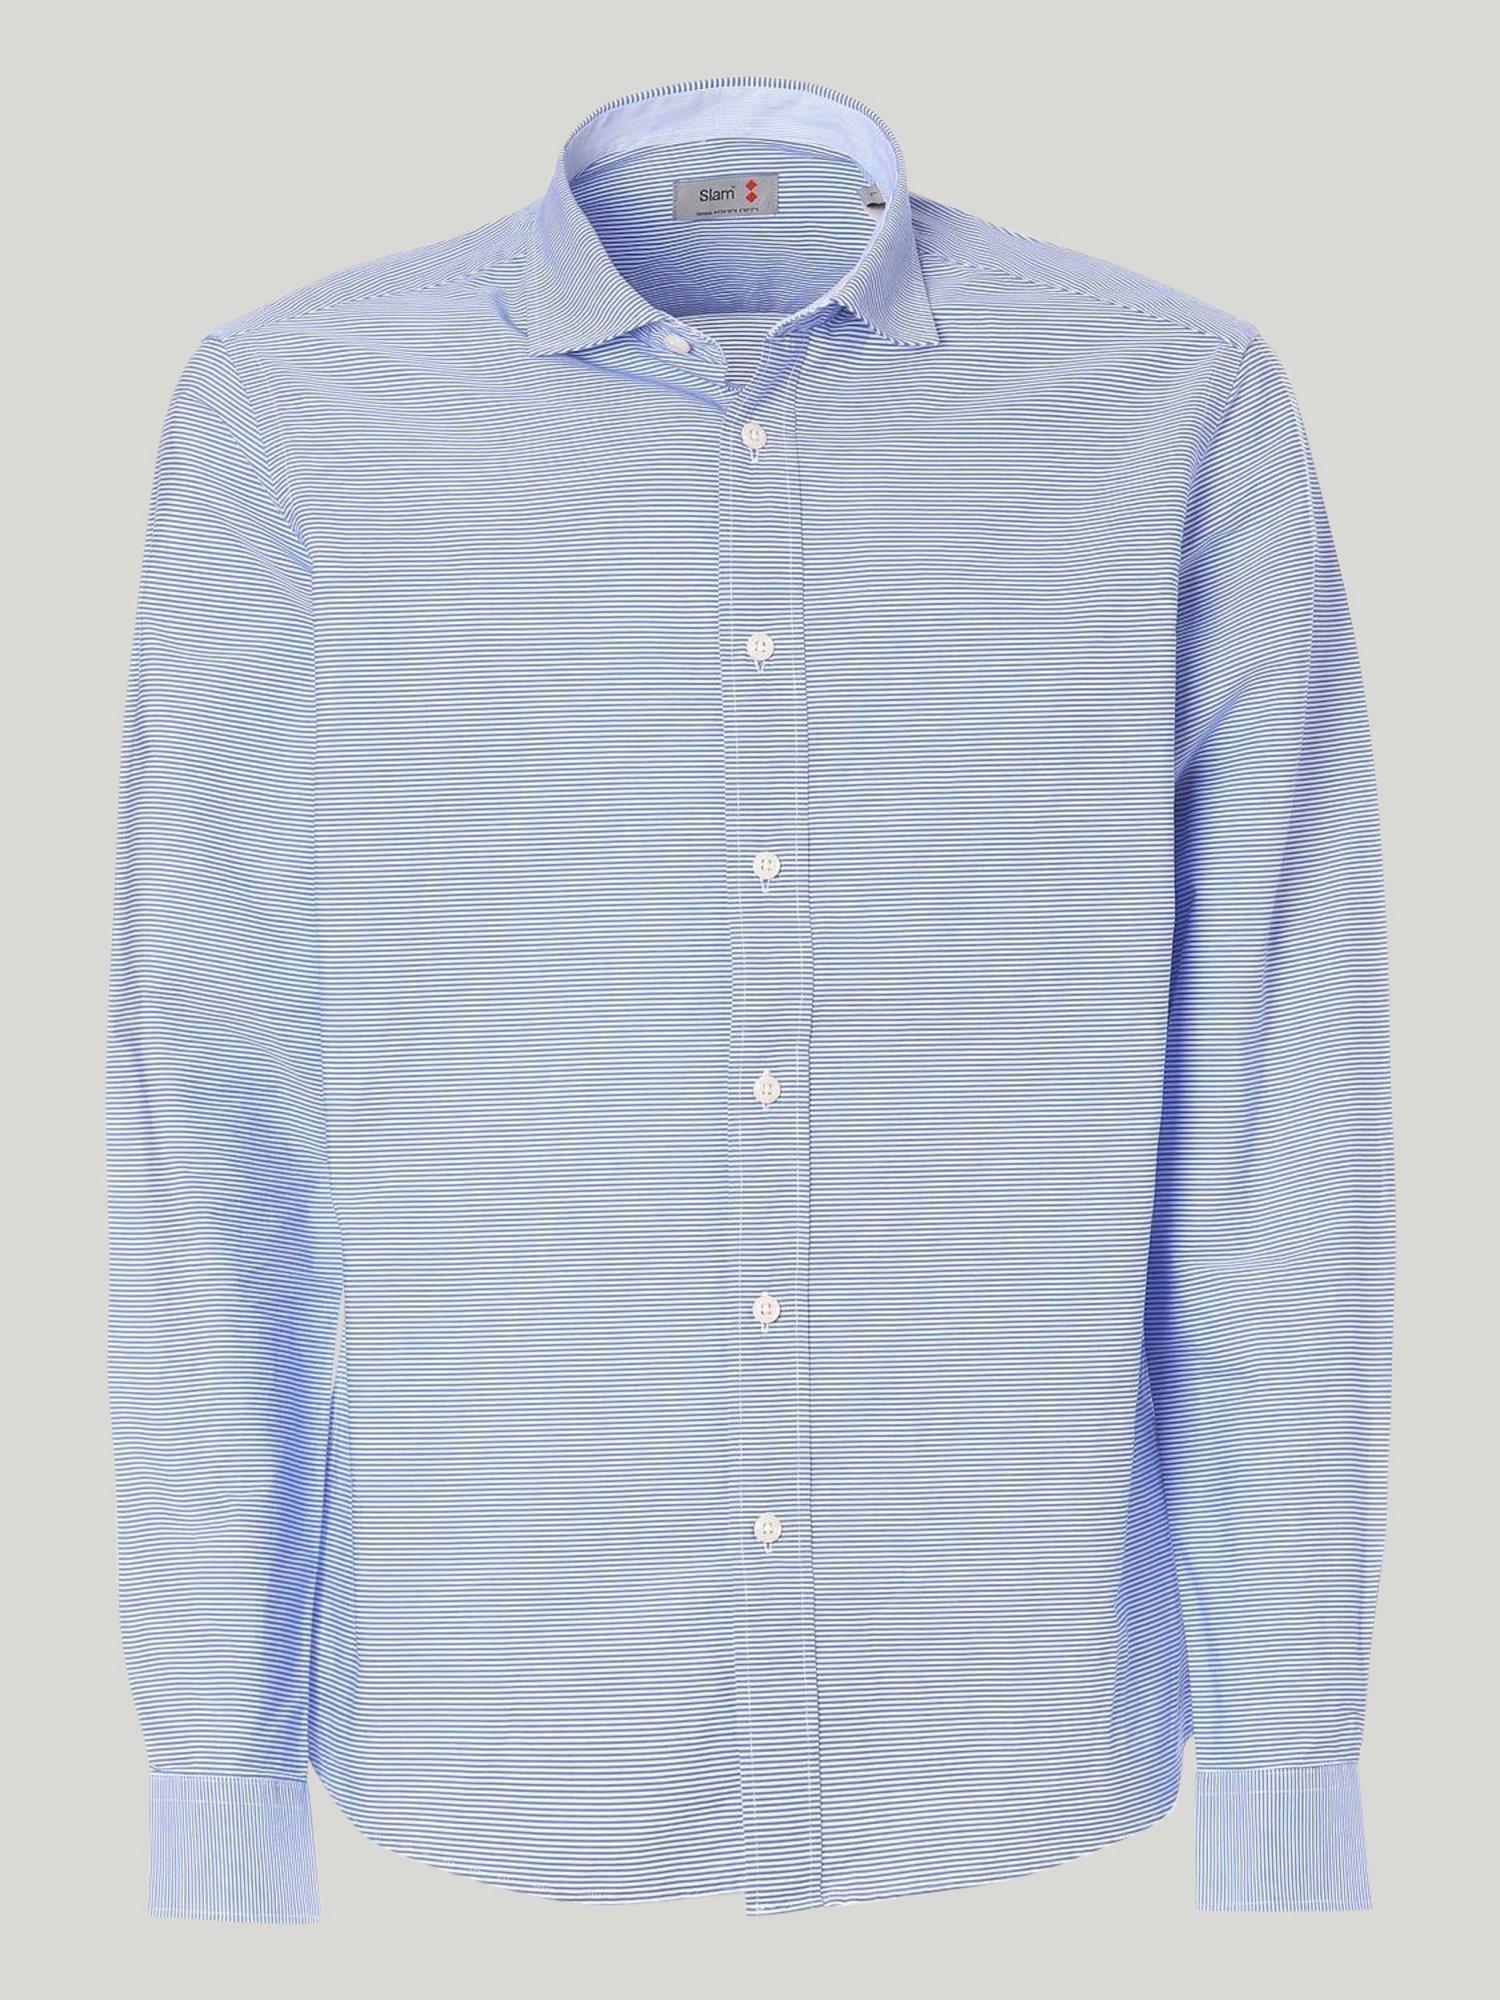 Keros shirt - Striped White / Light Blue